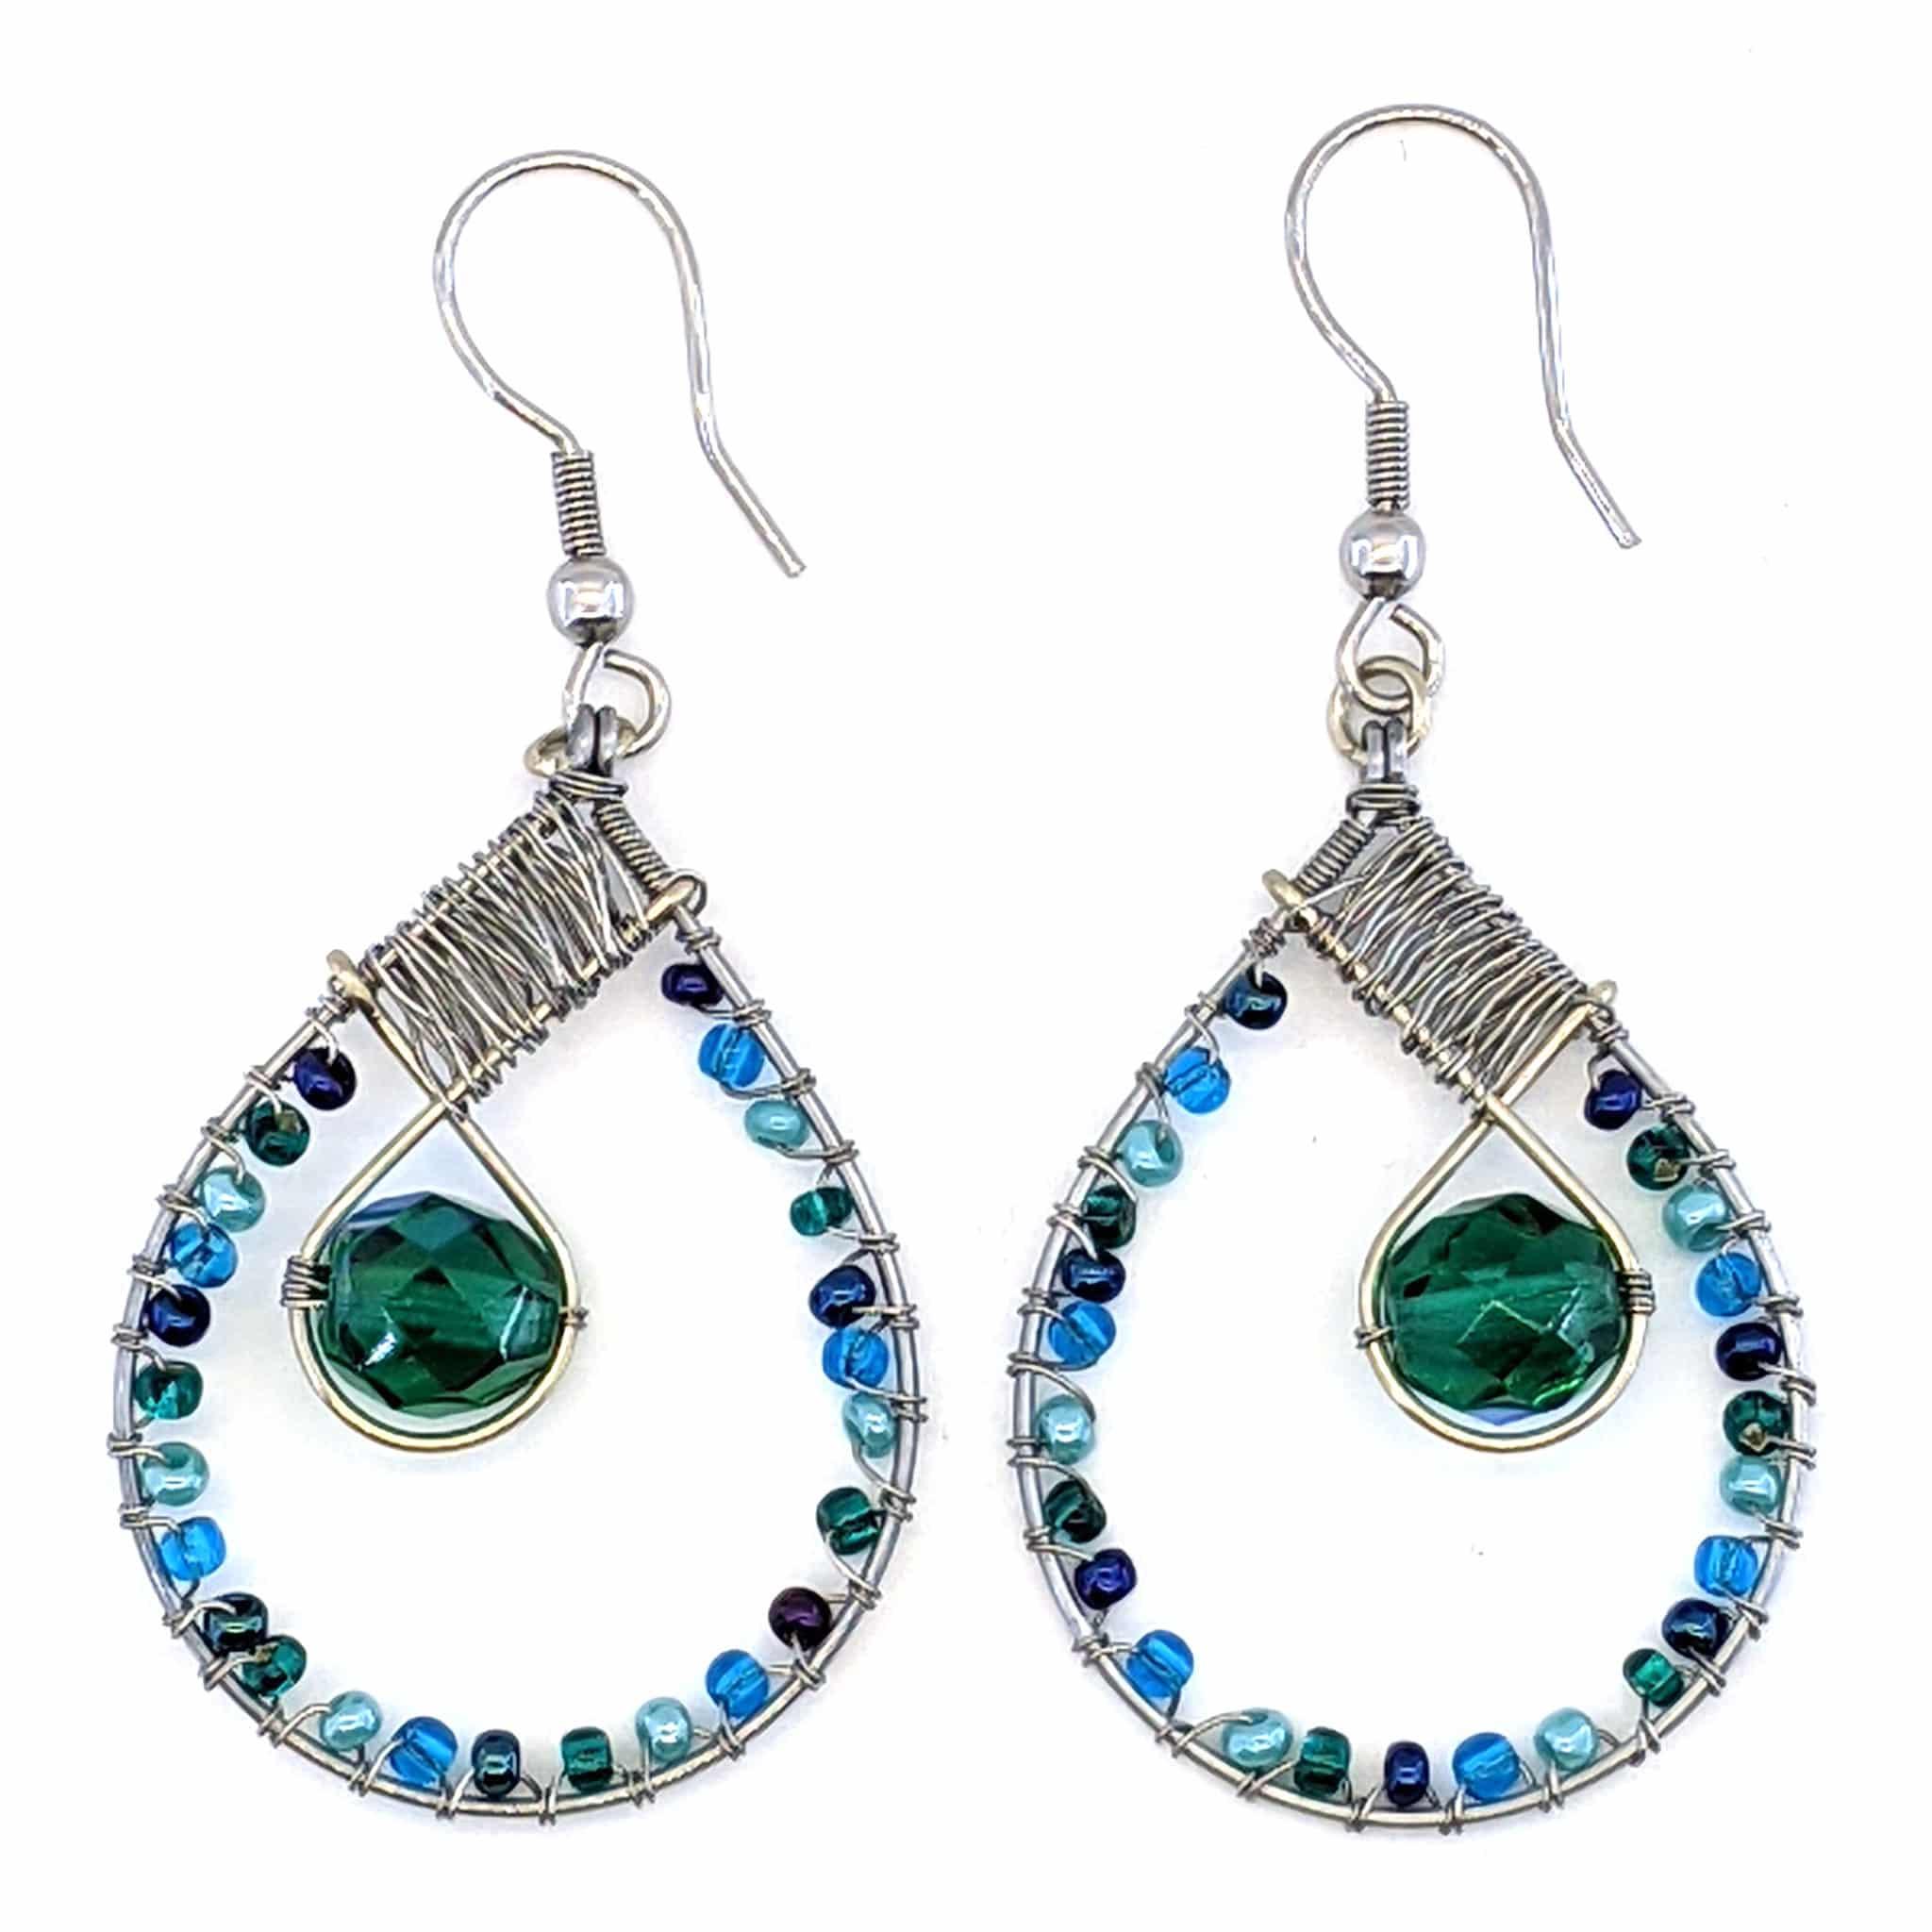 Teardrop with Crystal Beaded Earrings - Celestial Blues and Teal